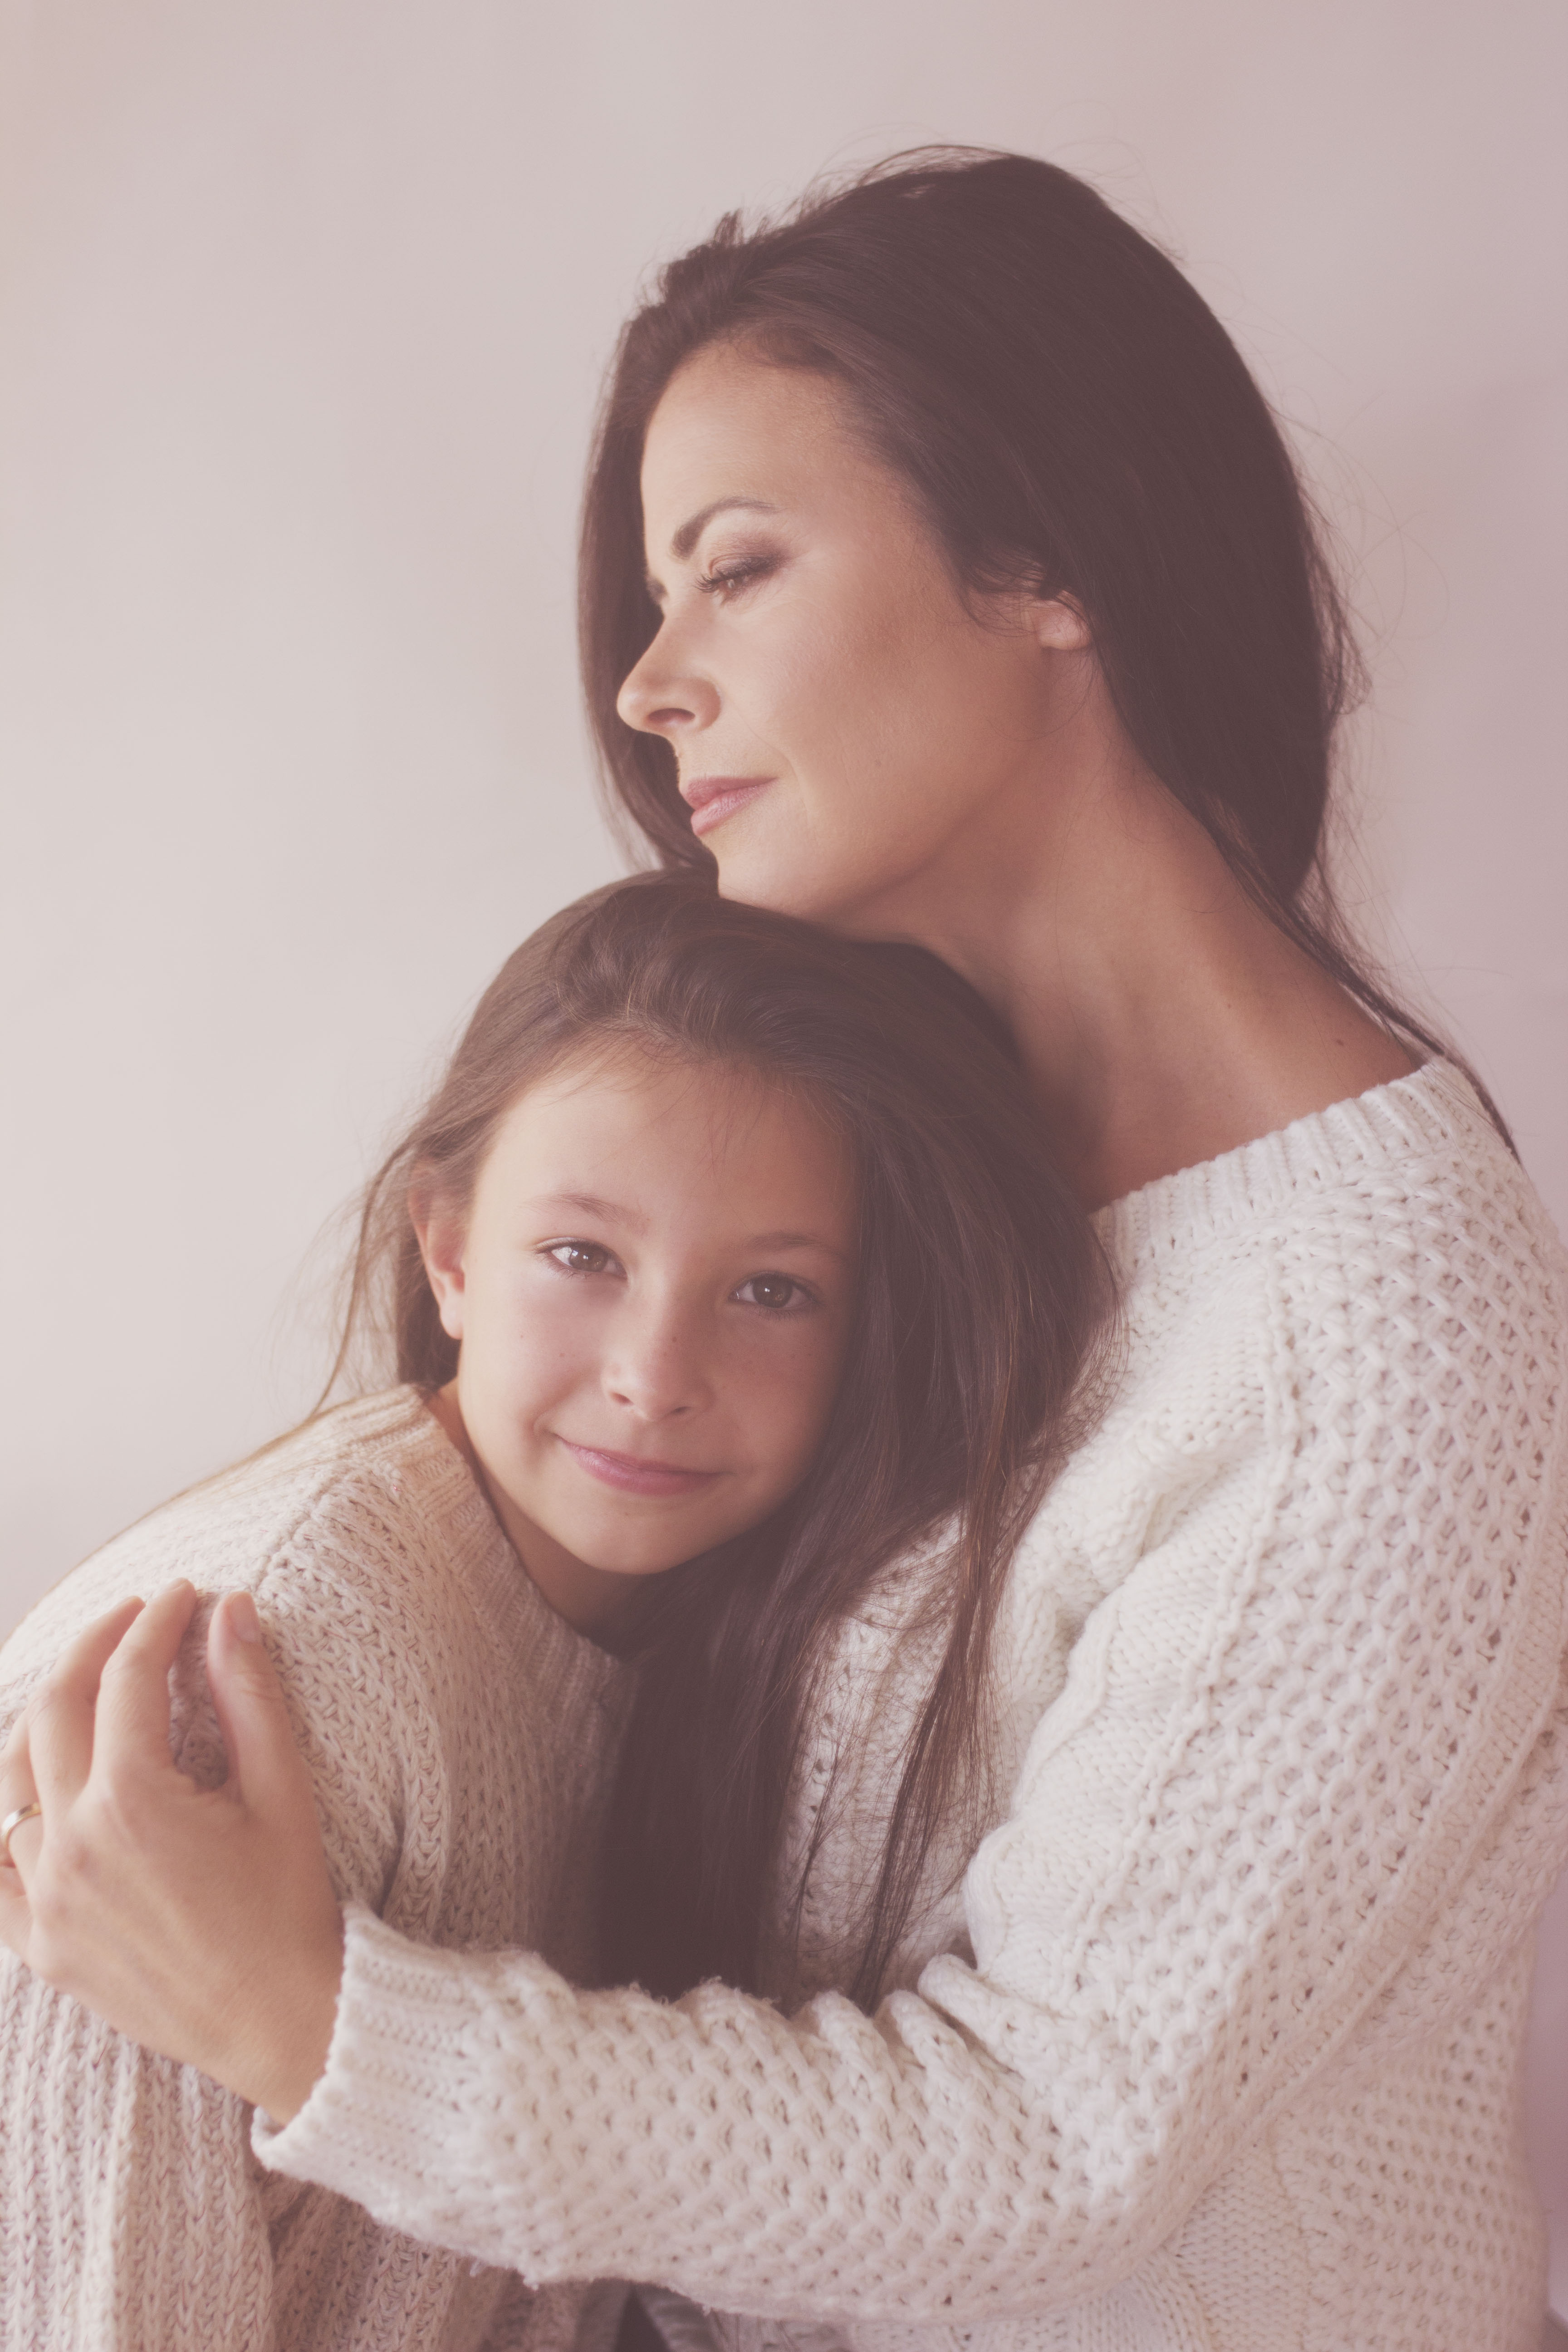 portrait mère fille en pull blanc